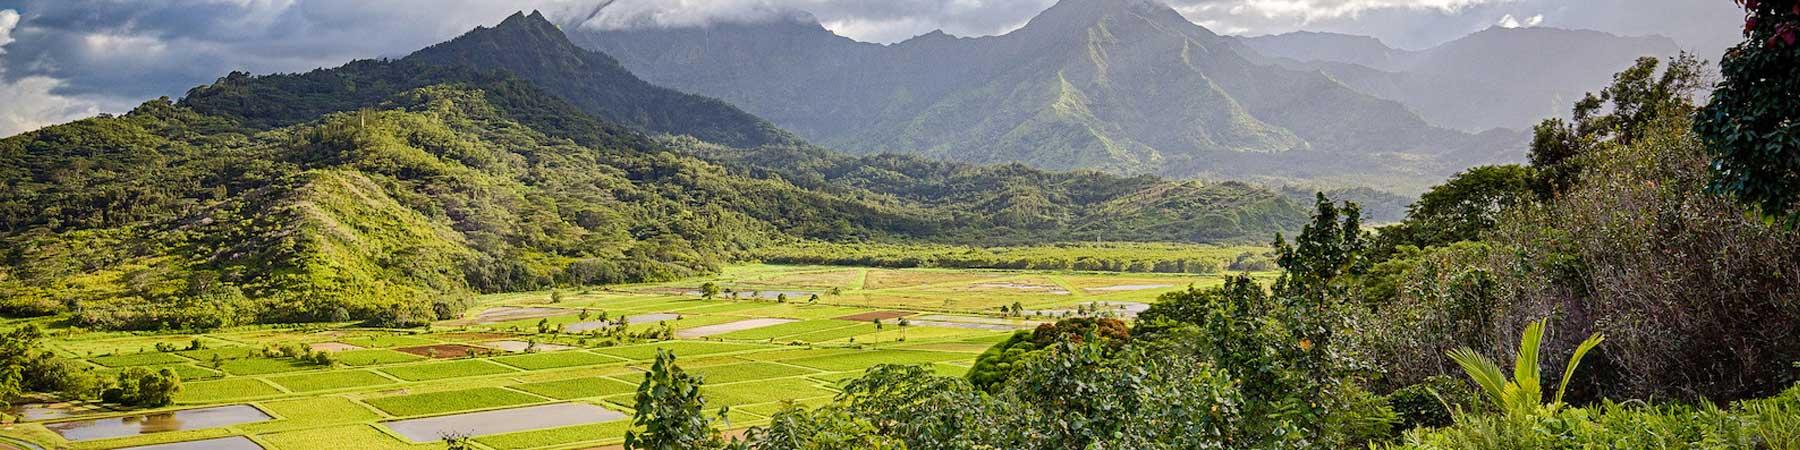 Hawaiʻi Wetlands Conservation Priority